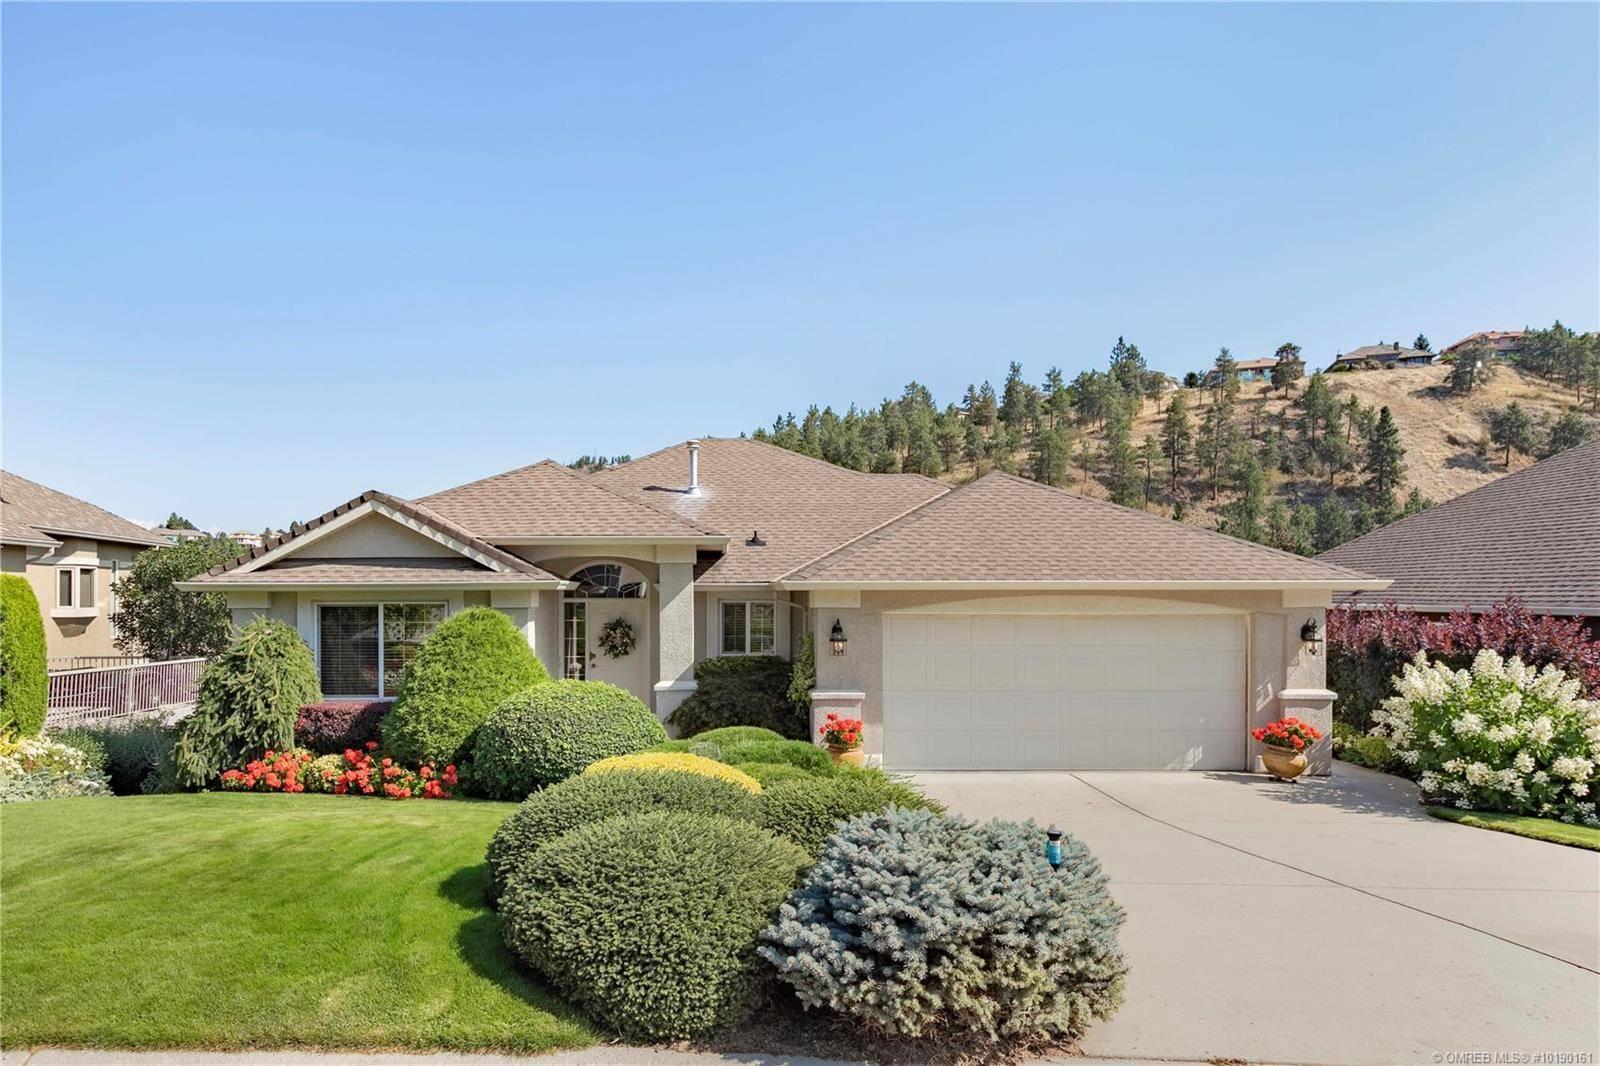 House for sale at 2188 Chilcotin Cres Kelowna British Columbia - MLS: 10190161